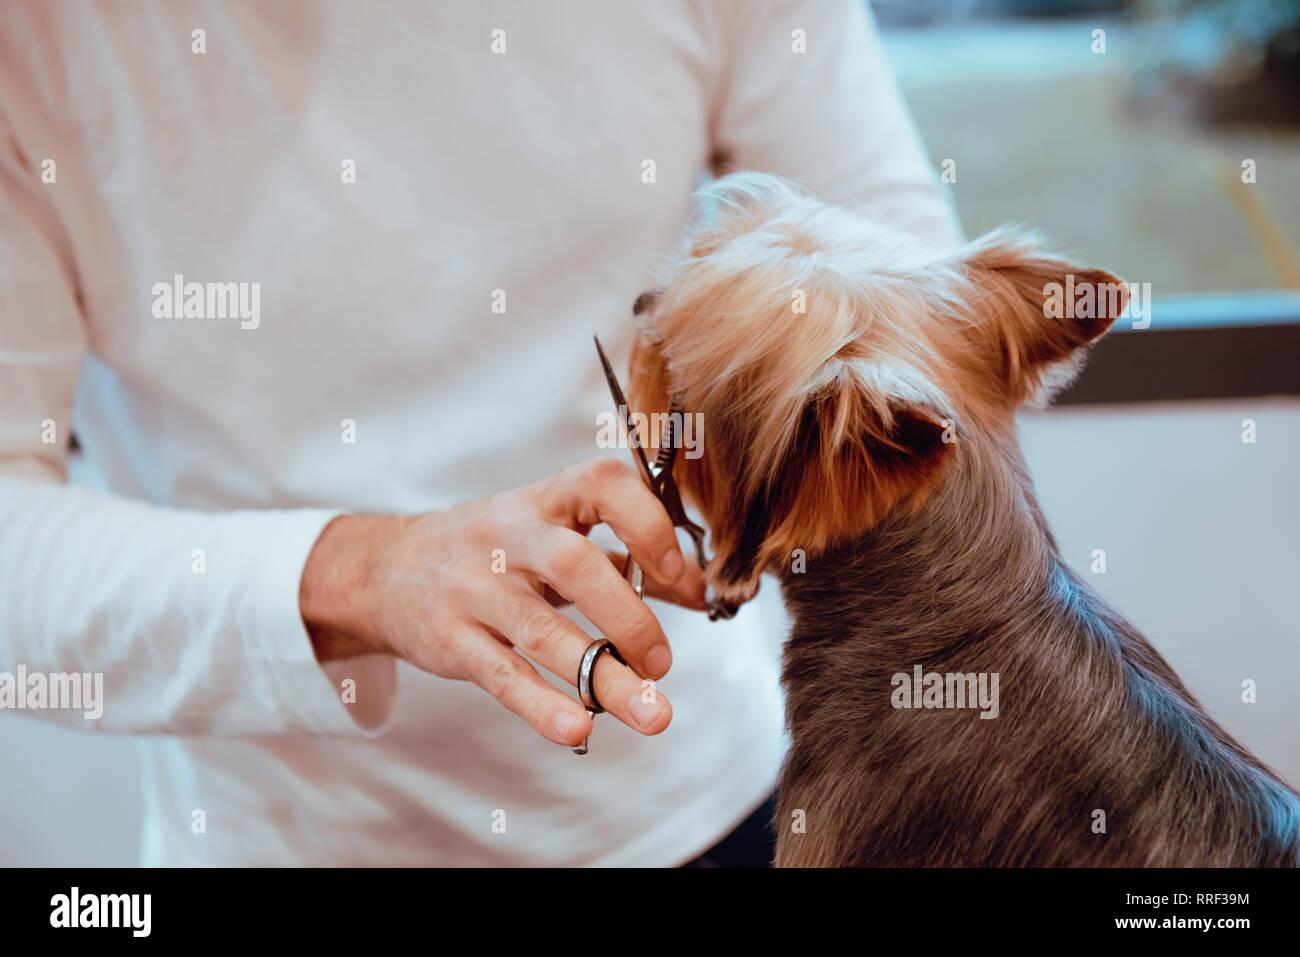 Crop groomer trimming fur of little dog - Stock Image